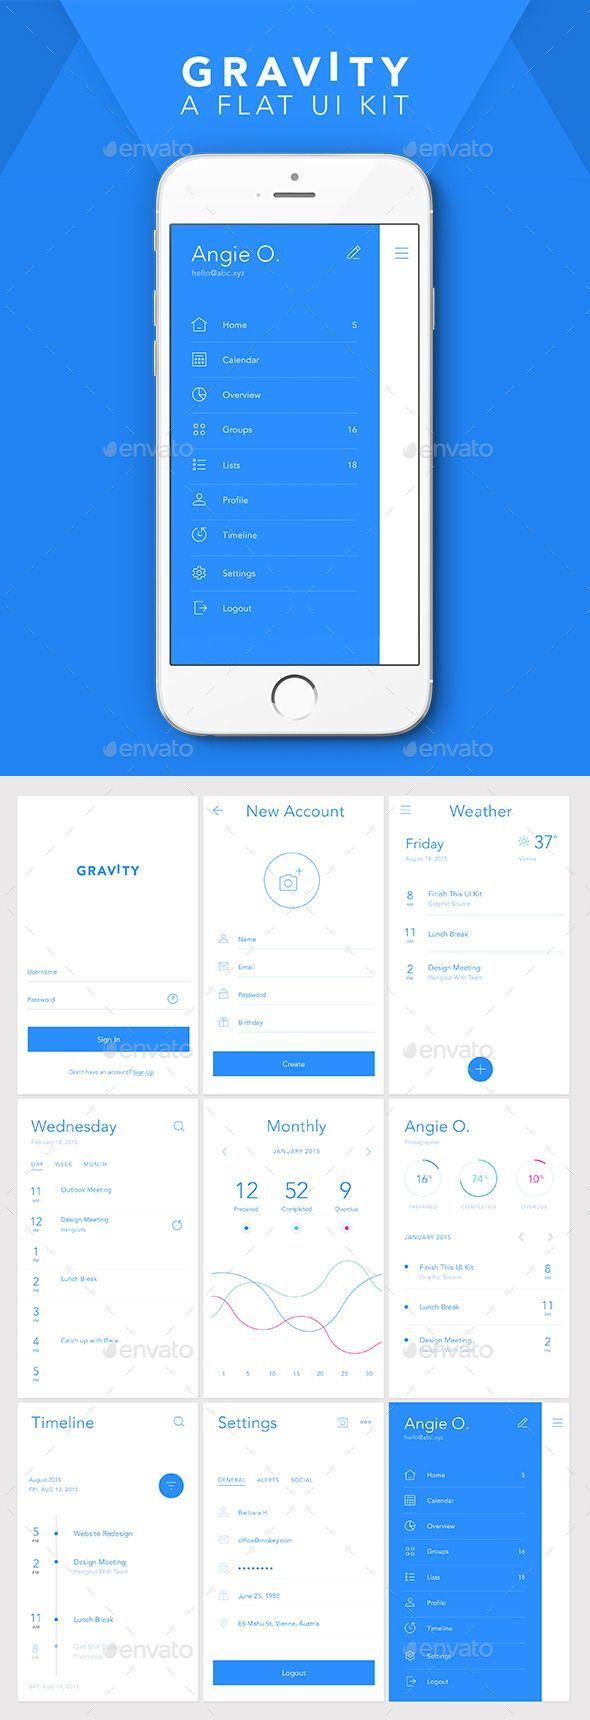 gravity flat mobile user interface kit template psd design ui